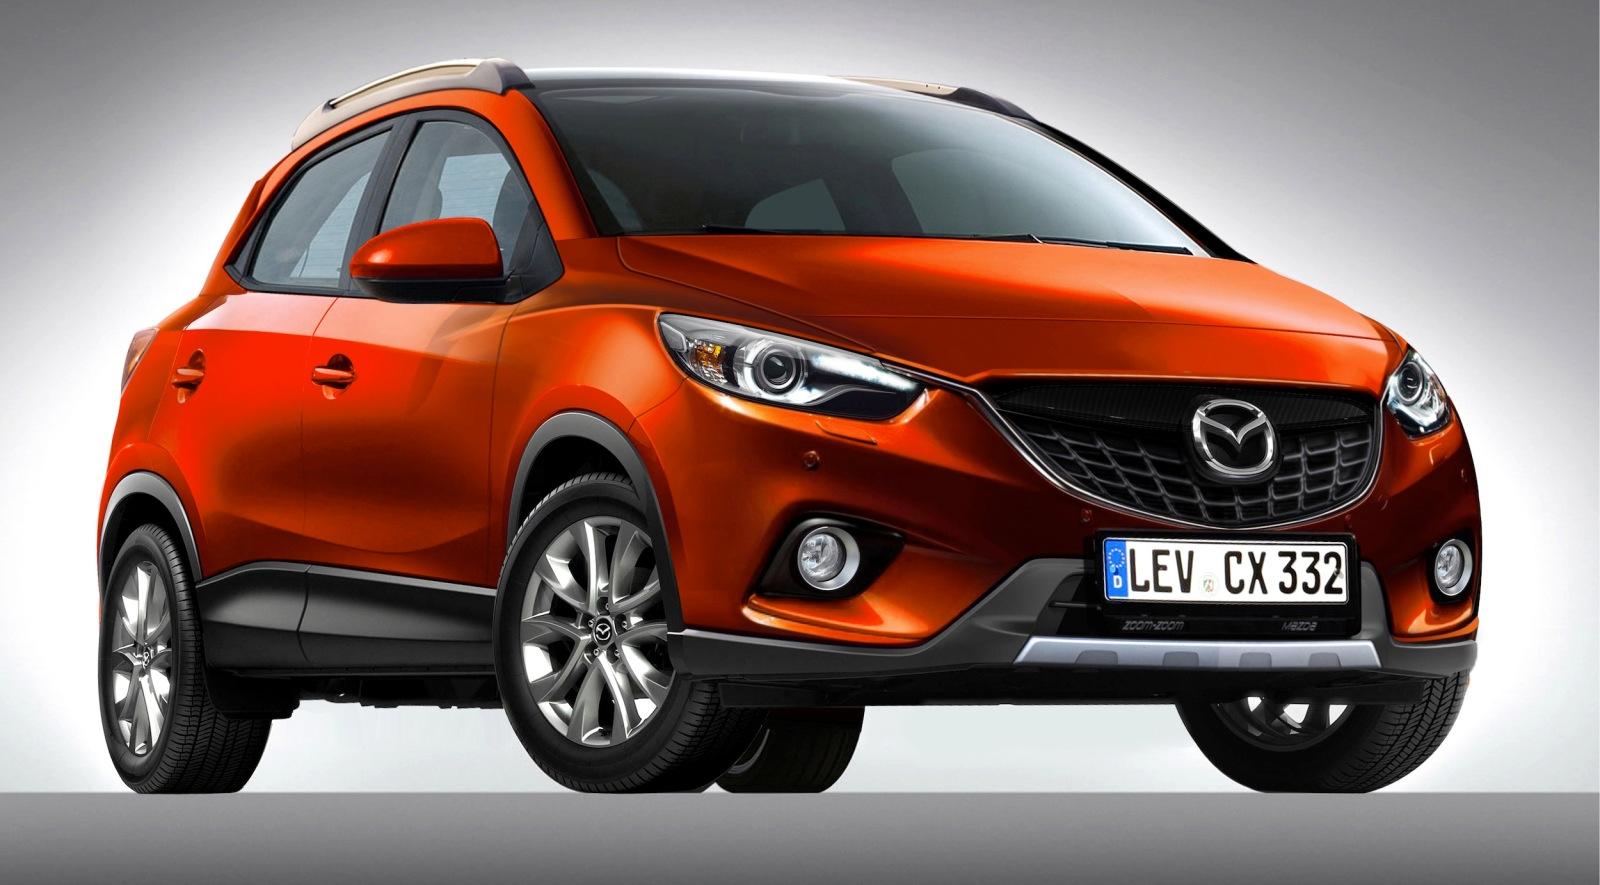 Mazda Crossover Vehicles 45 Cool Car Hd Wallpaper